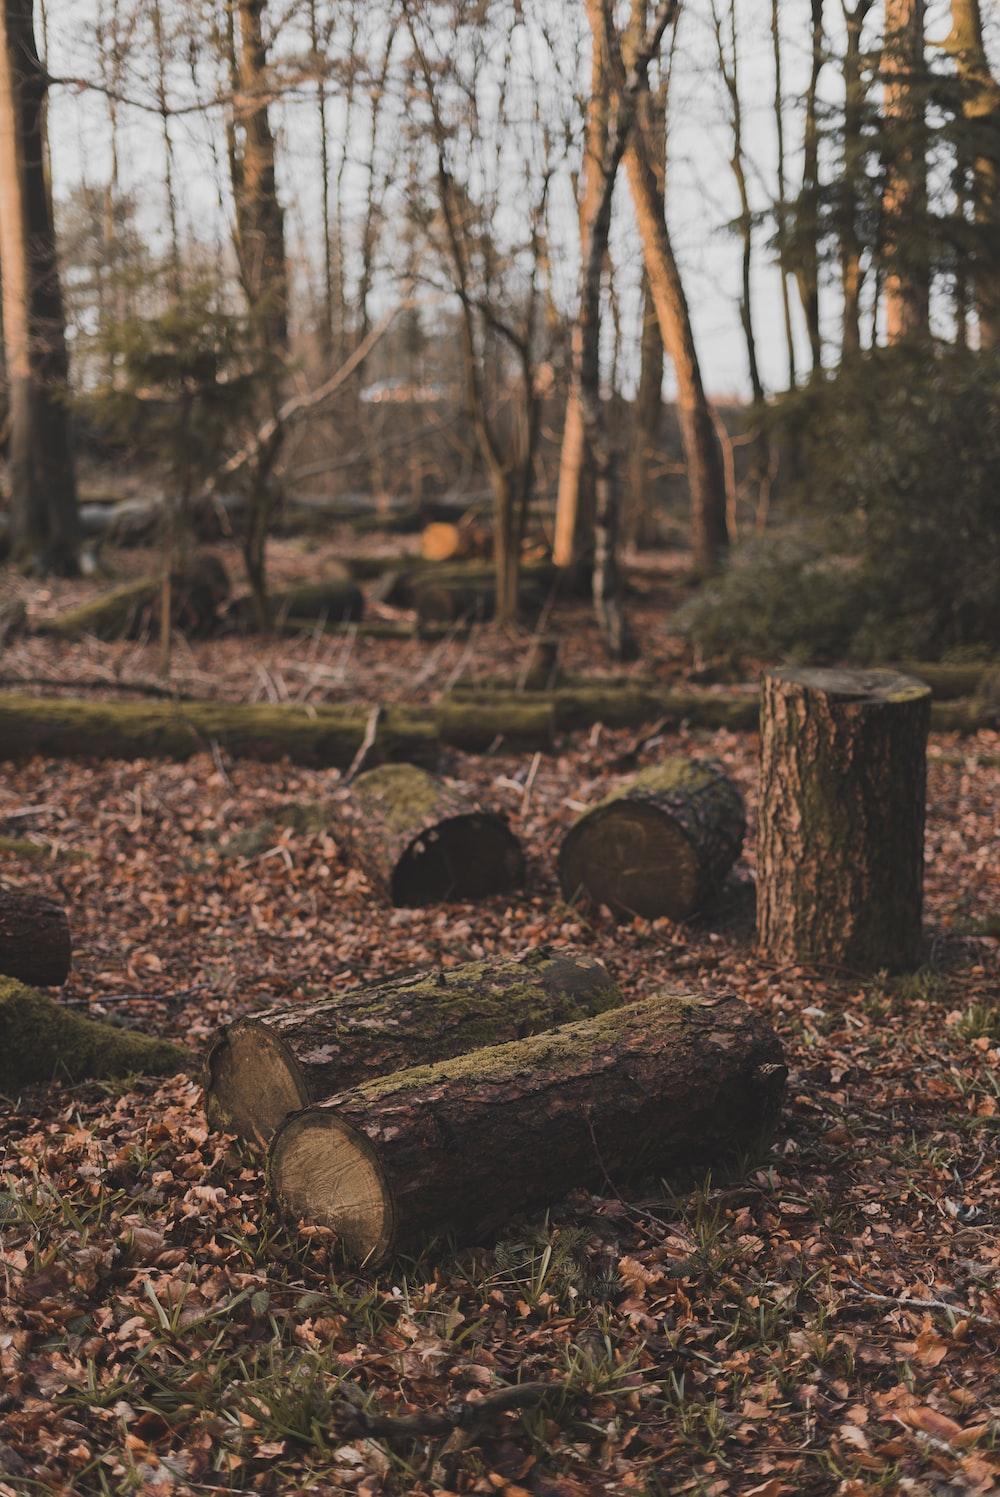 brown tree log on ground